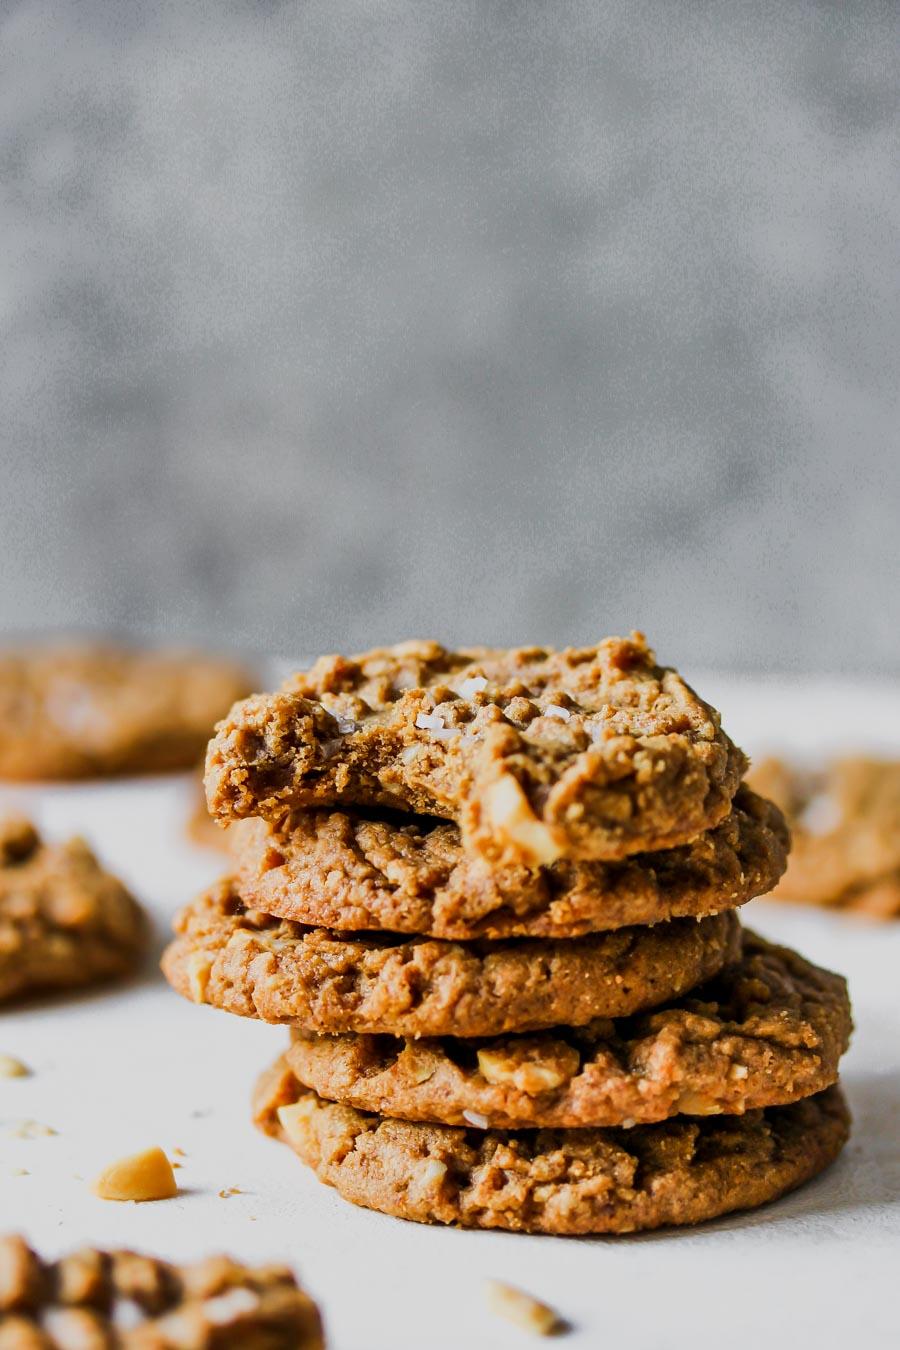 Flourless 5-Ingredient Peanut Butter Cookies